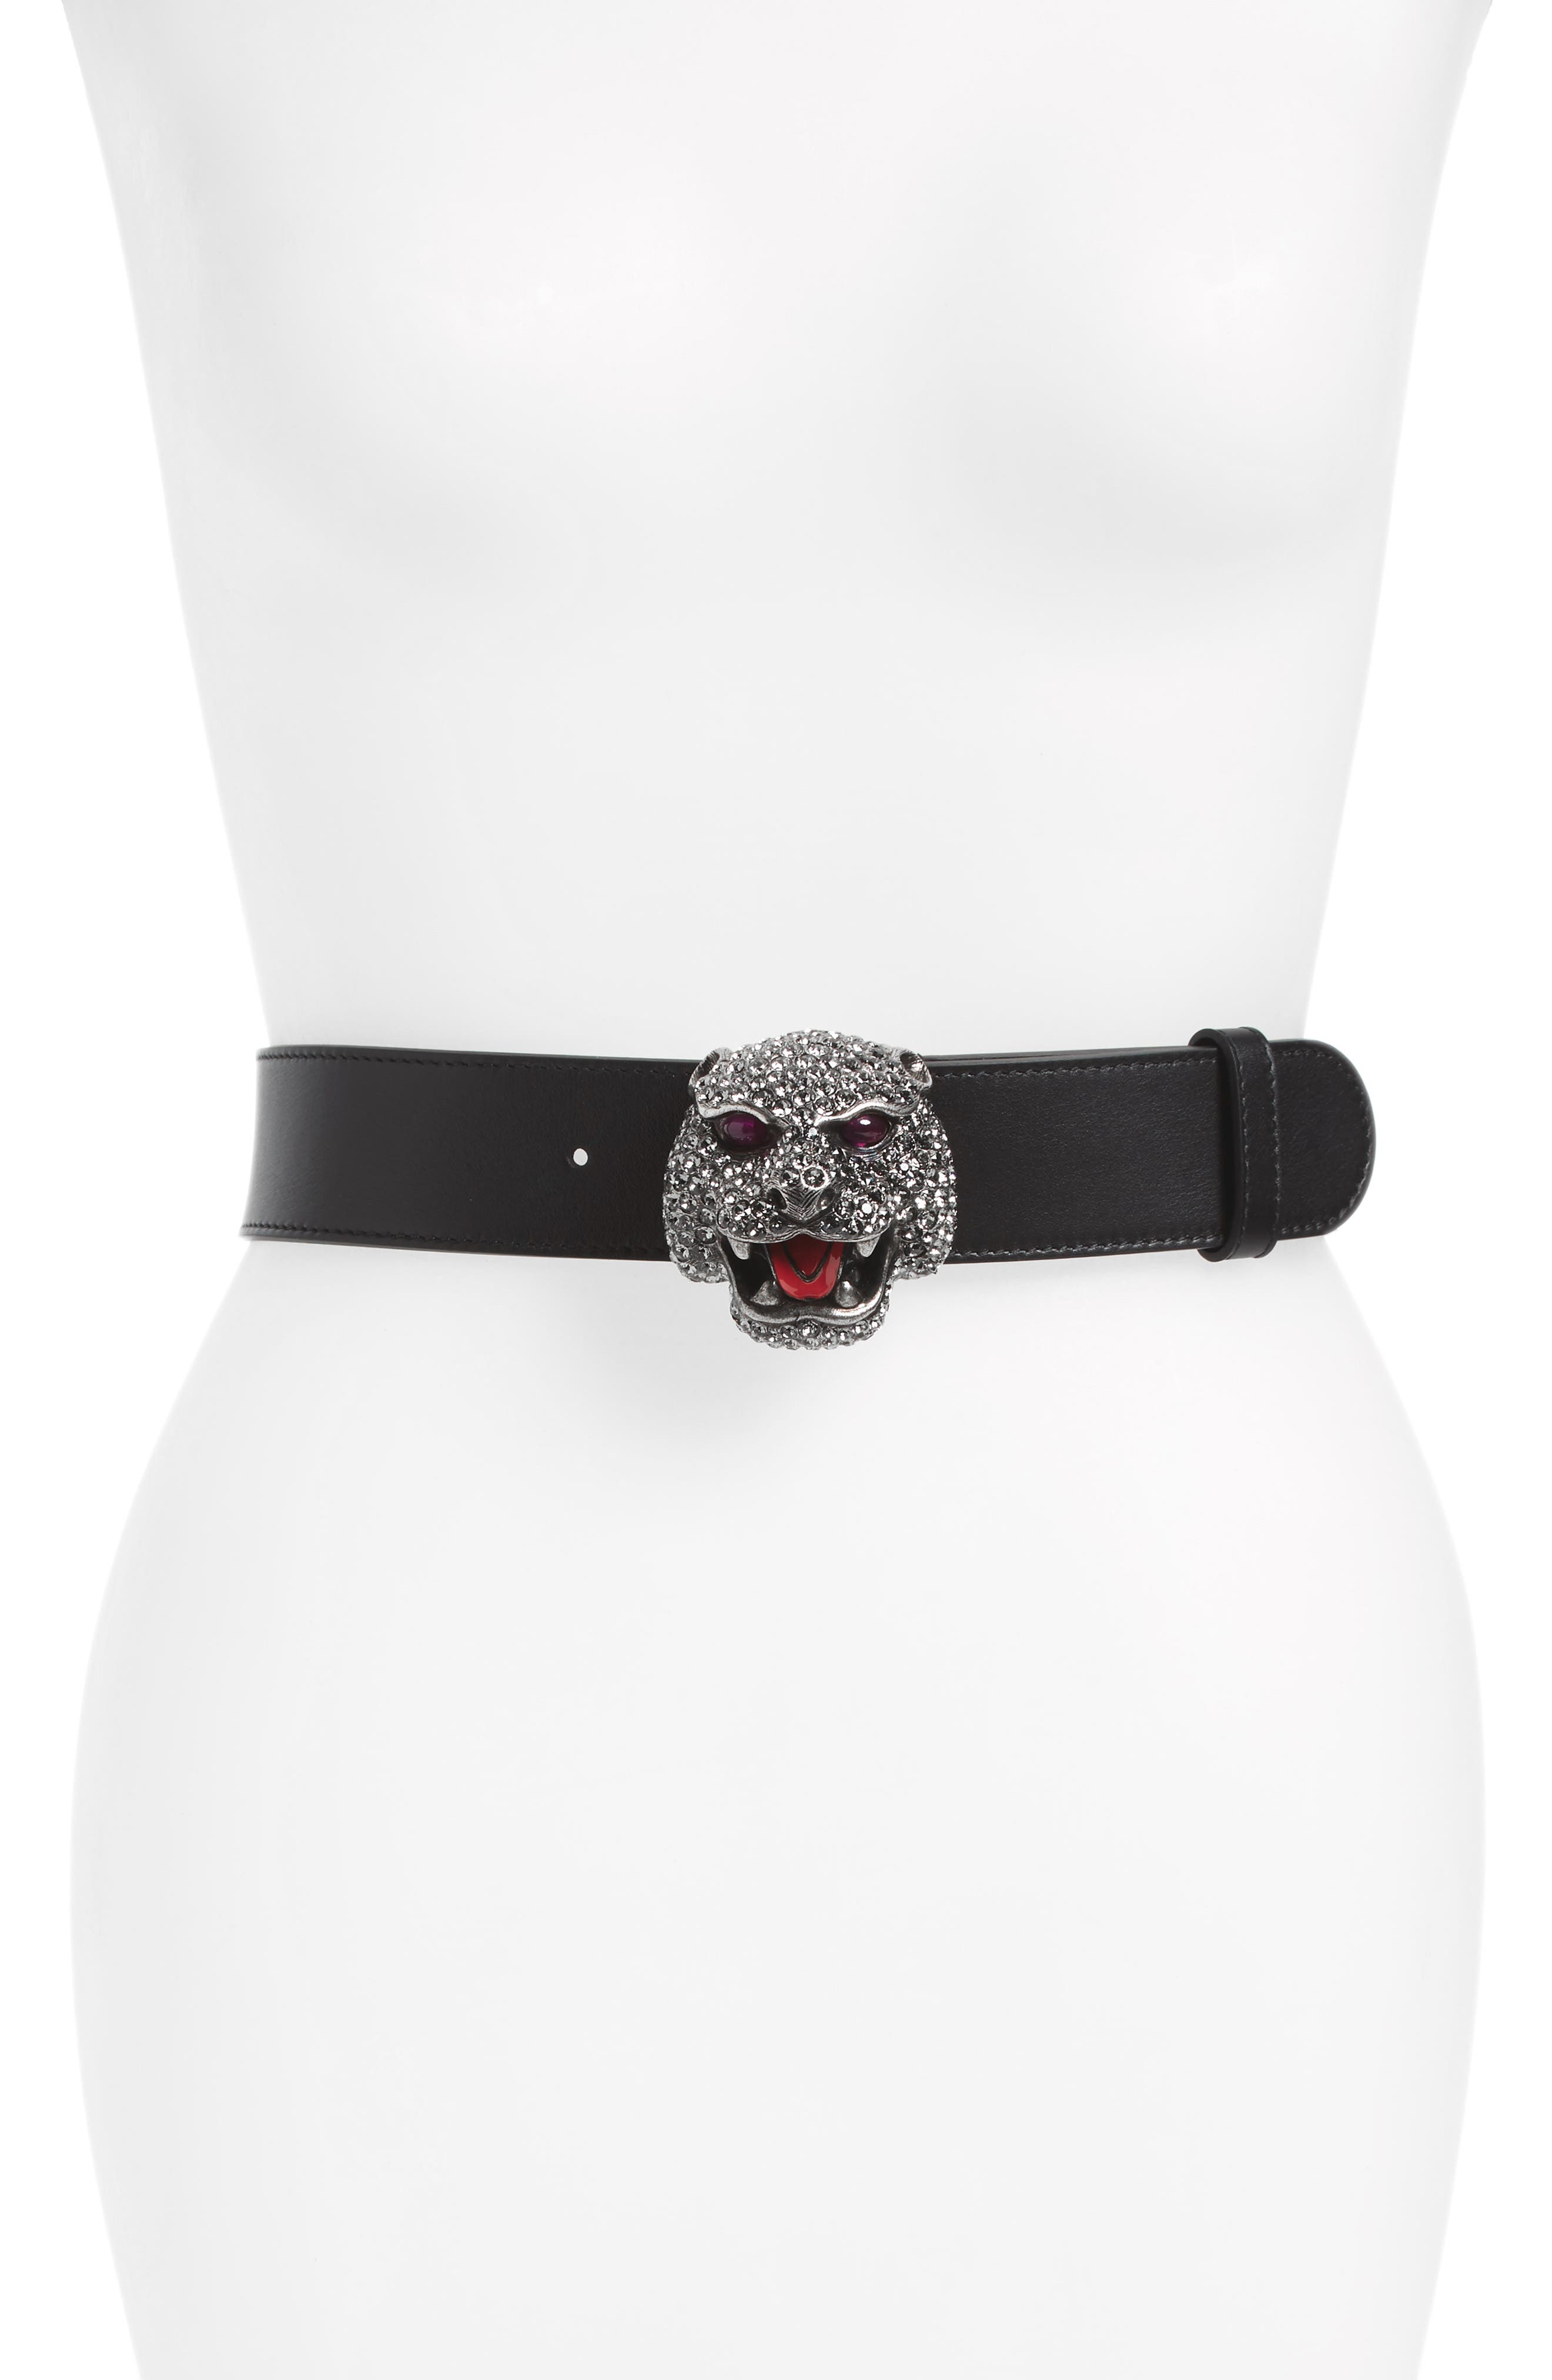 Main Image - Gucci Tiger Buckle Calfskin Leather Belt